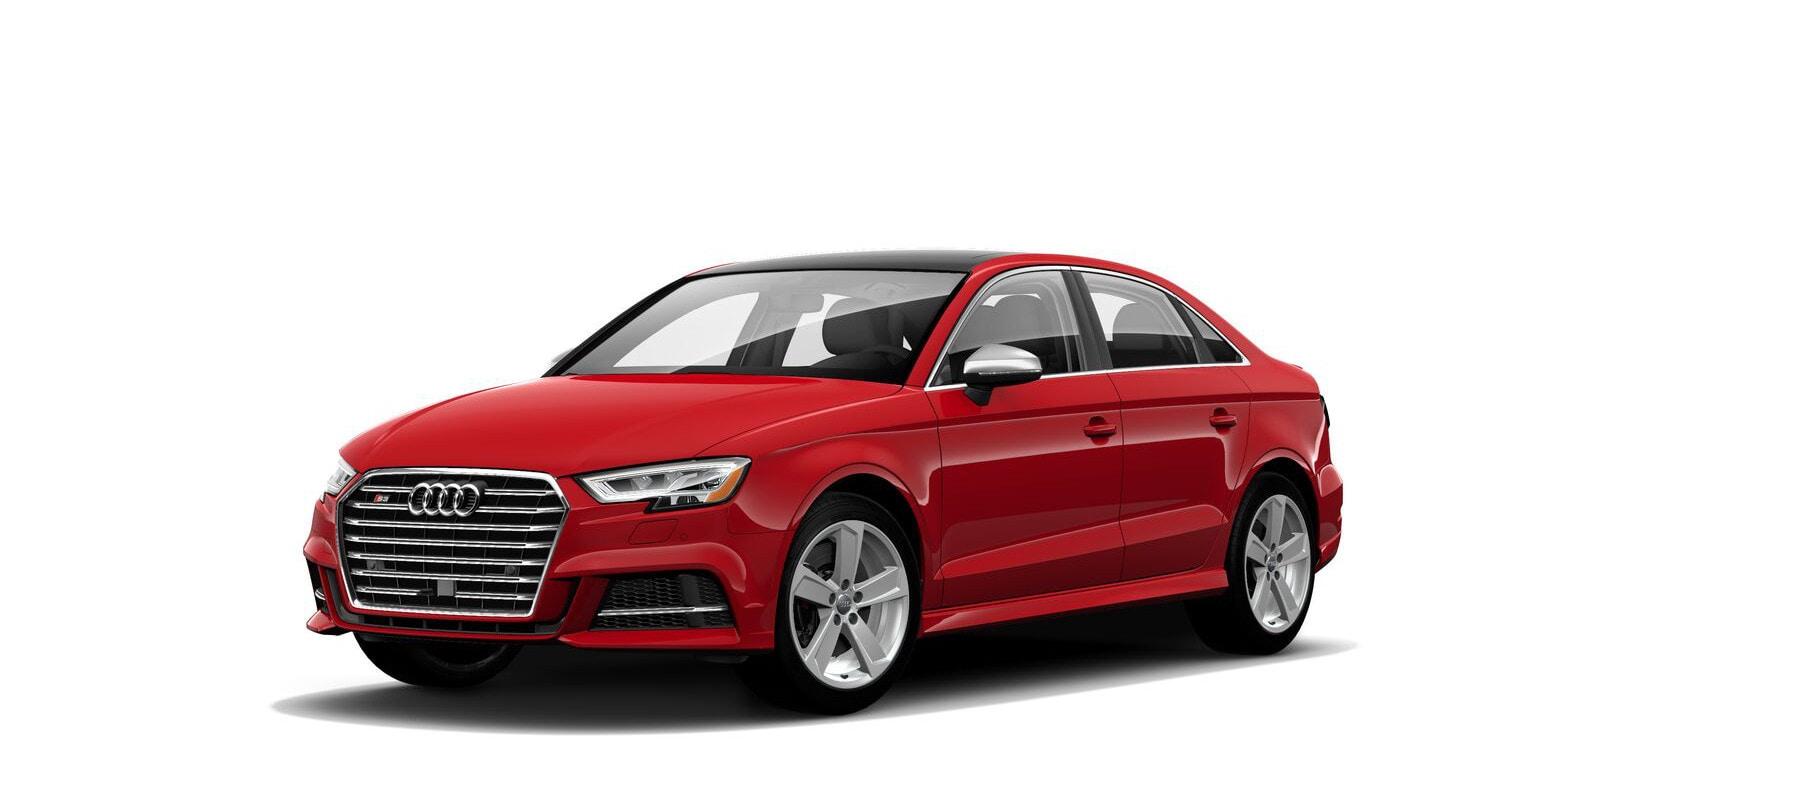 2018 Audi A3 Vs S3 In Schaumburg Il Audi Hoffman Estates